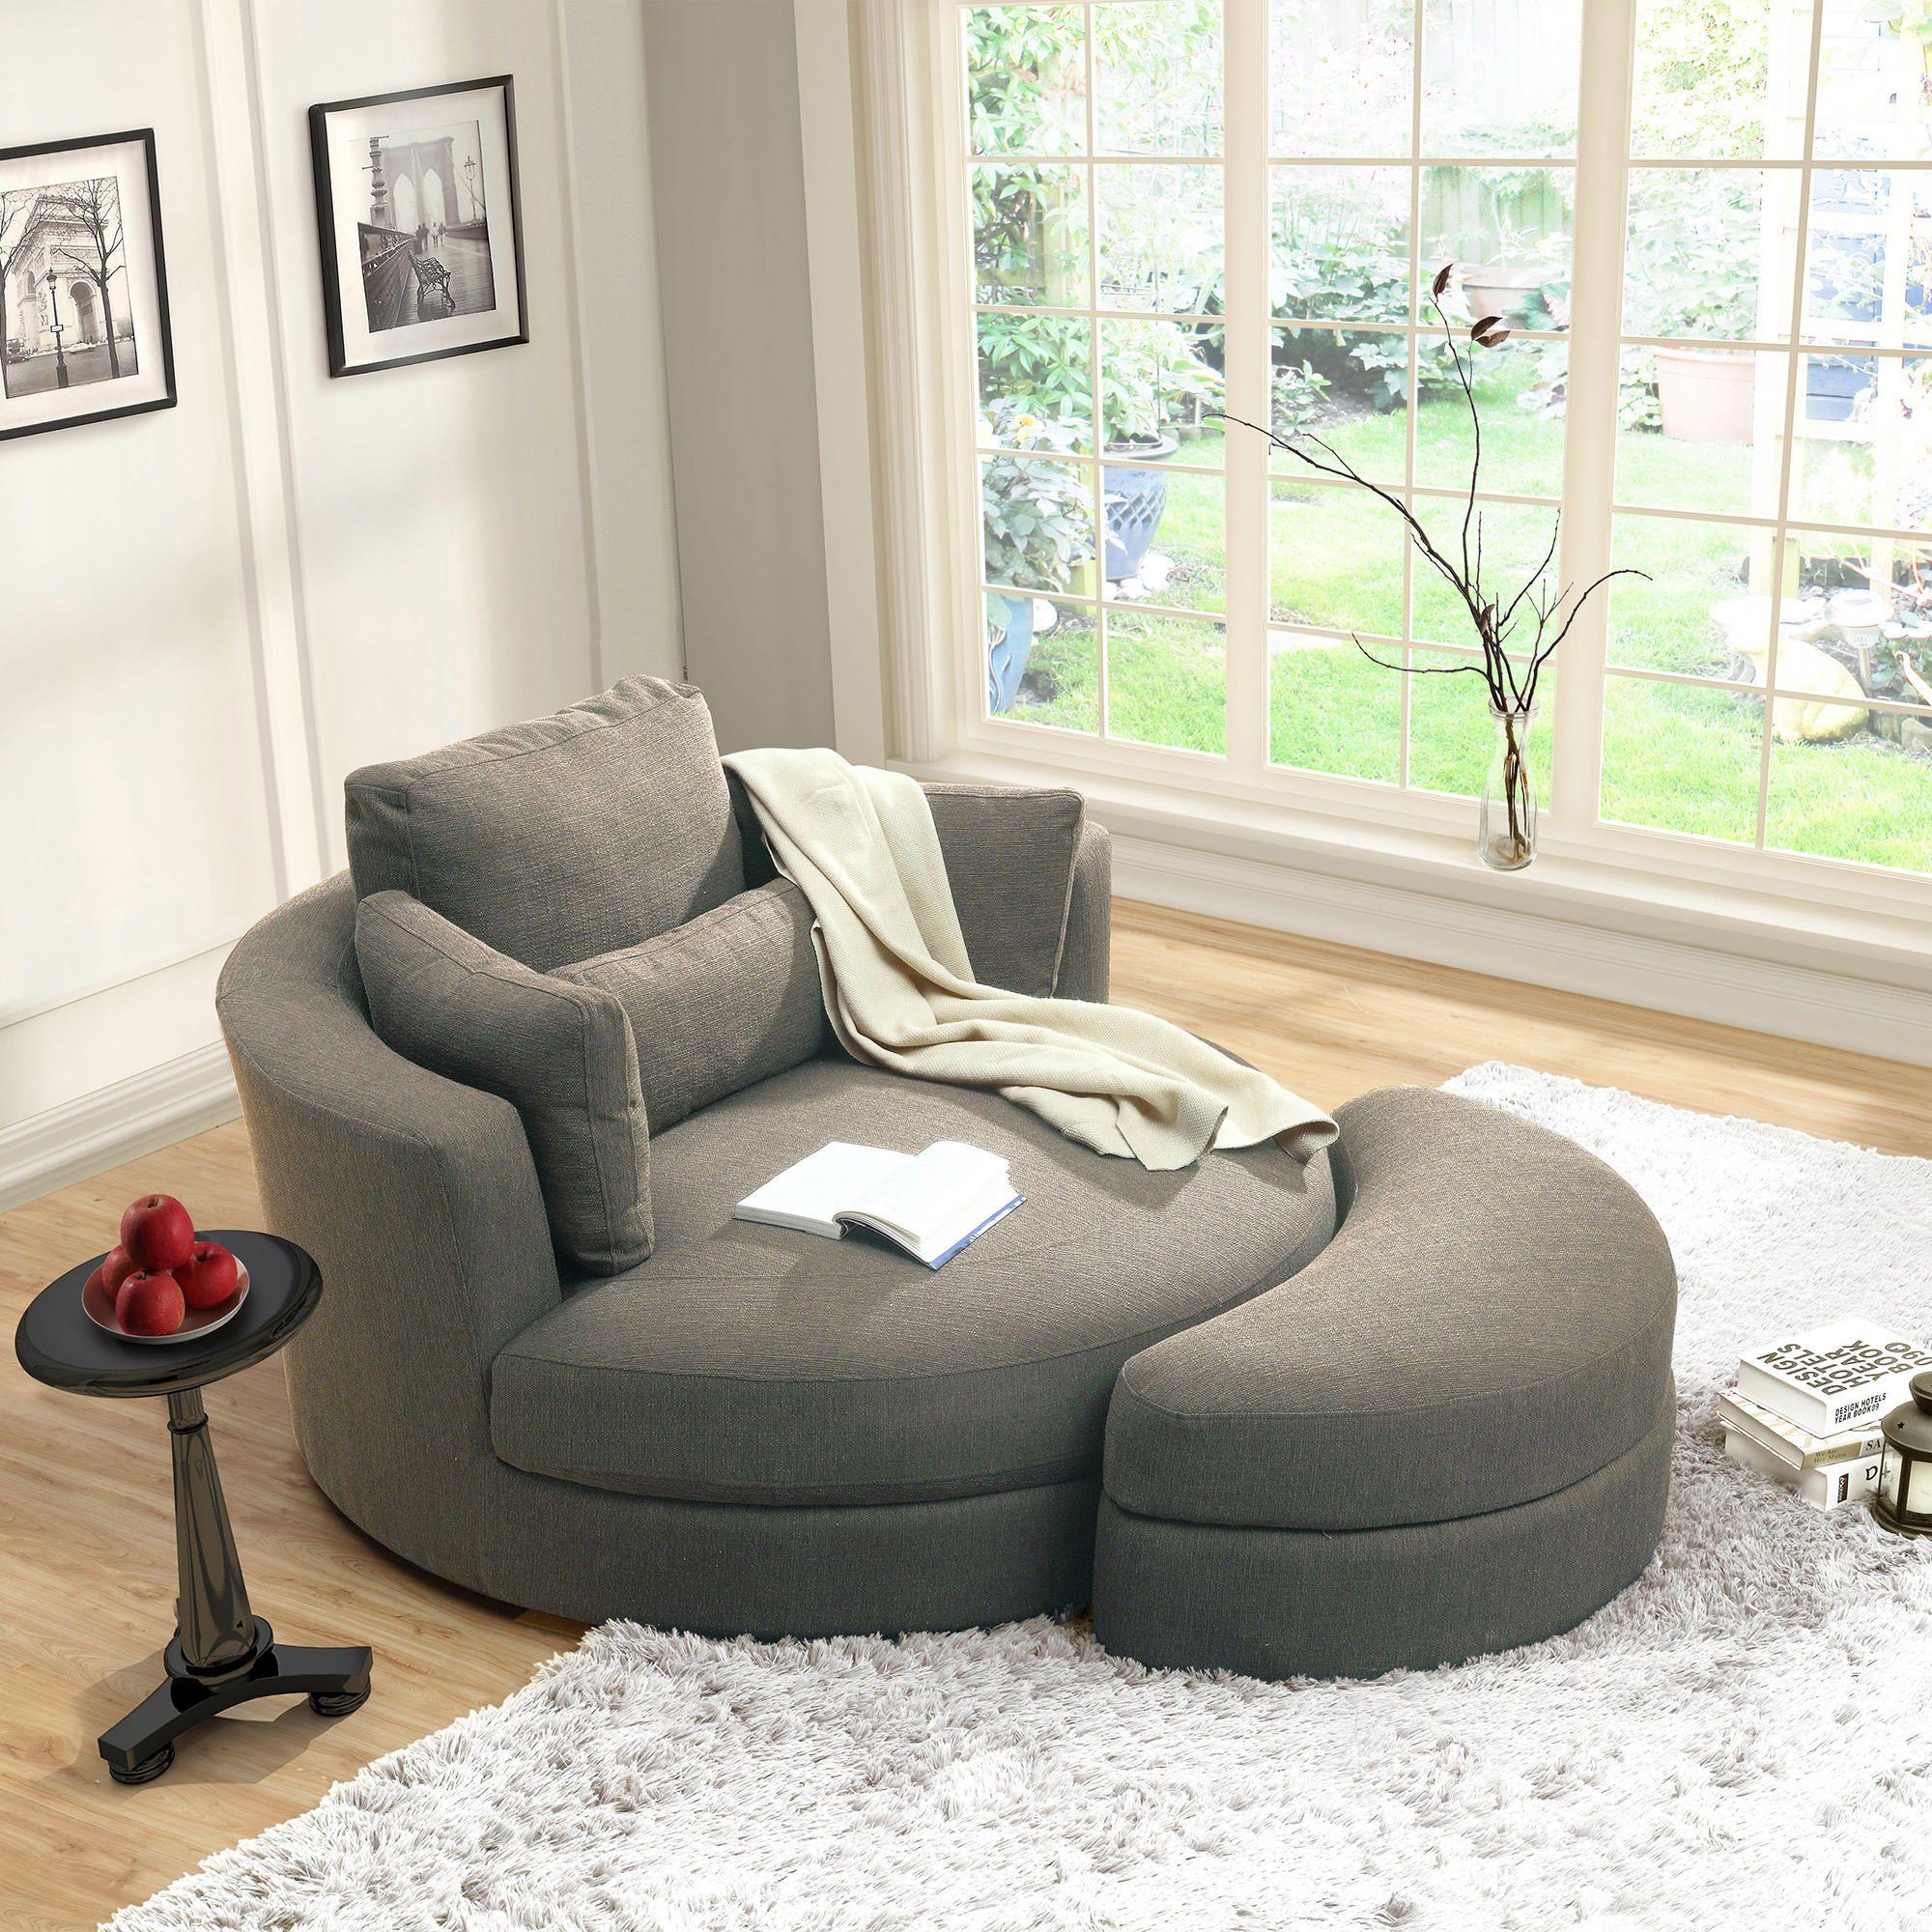 Turner Grey Cuddler Swivel Chair with Storage Ottoman